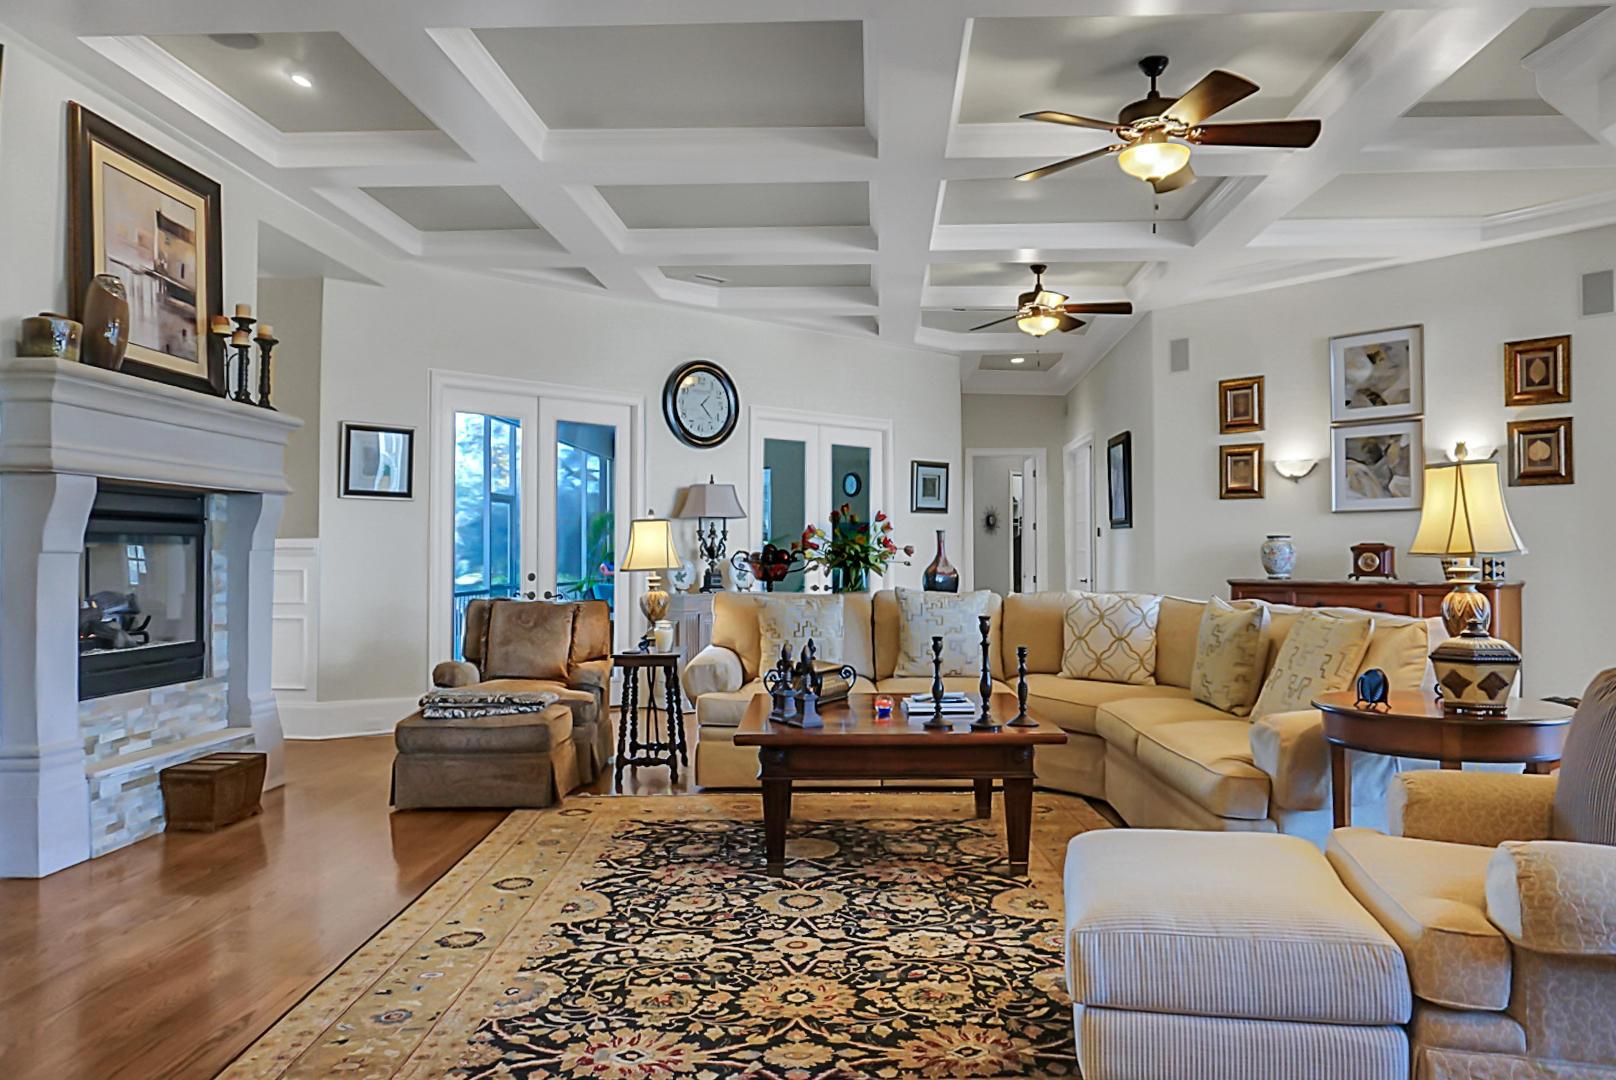 Dunes West Homes For Sale - 2389 Darts Cove, Mount Pleasant, SC - 54